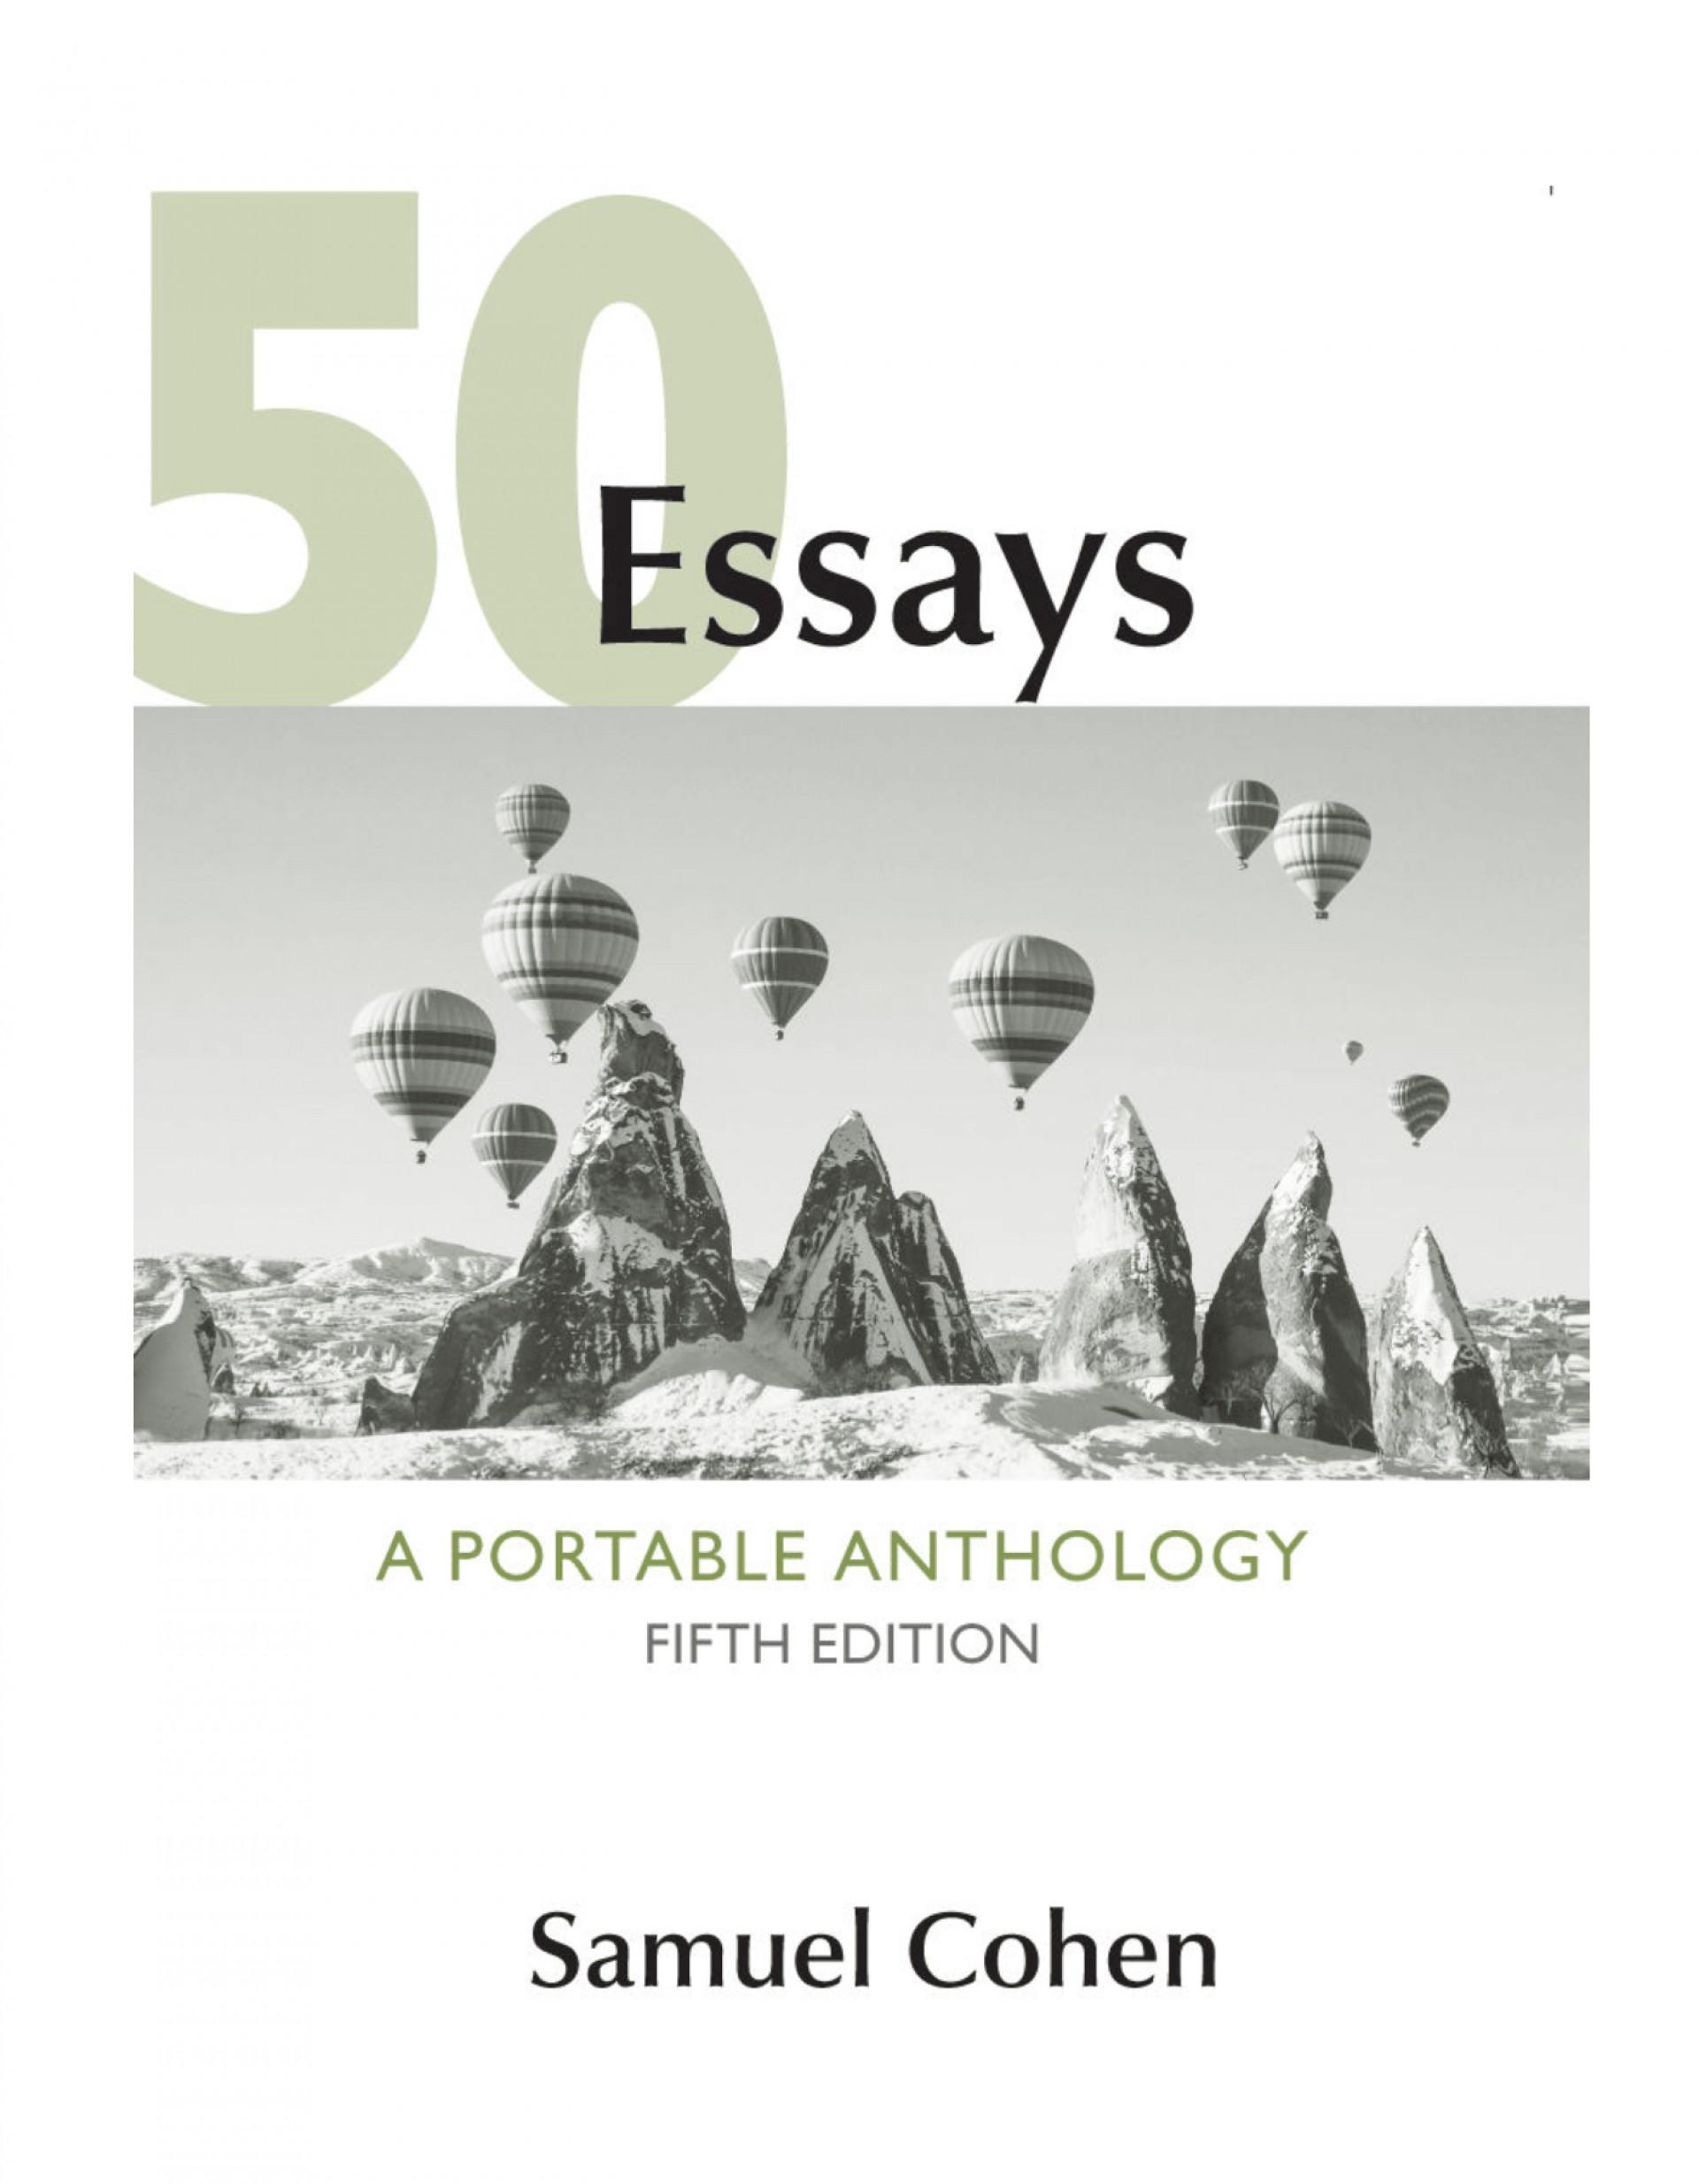 006 50fit14002c1800ssl1 Essays Portable Anthology 5th Edition Pdf Essay Fascinating 50 A 1920